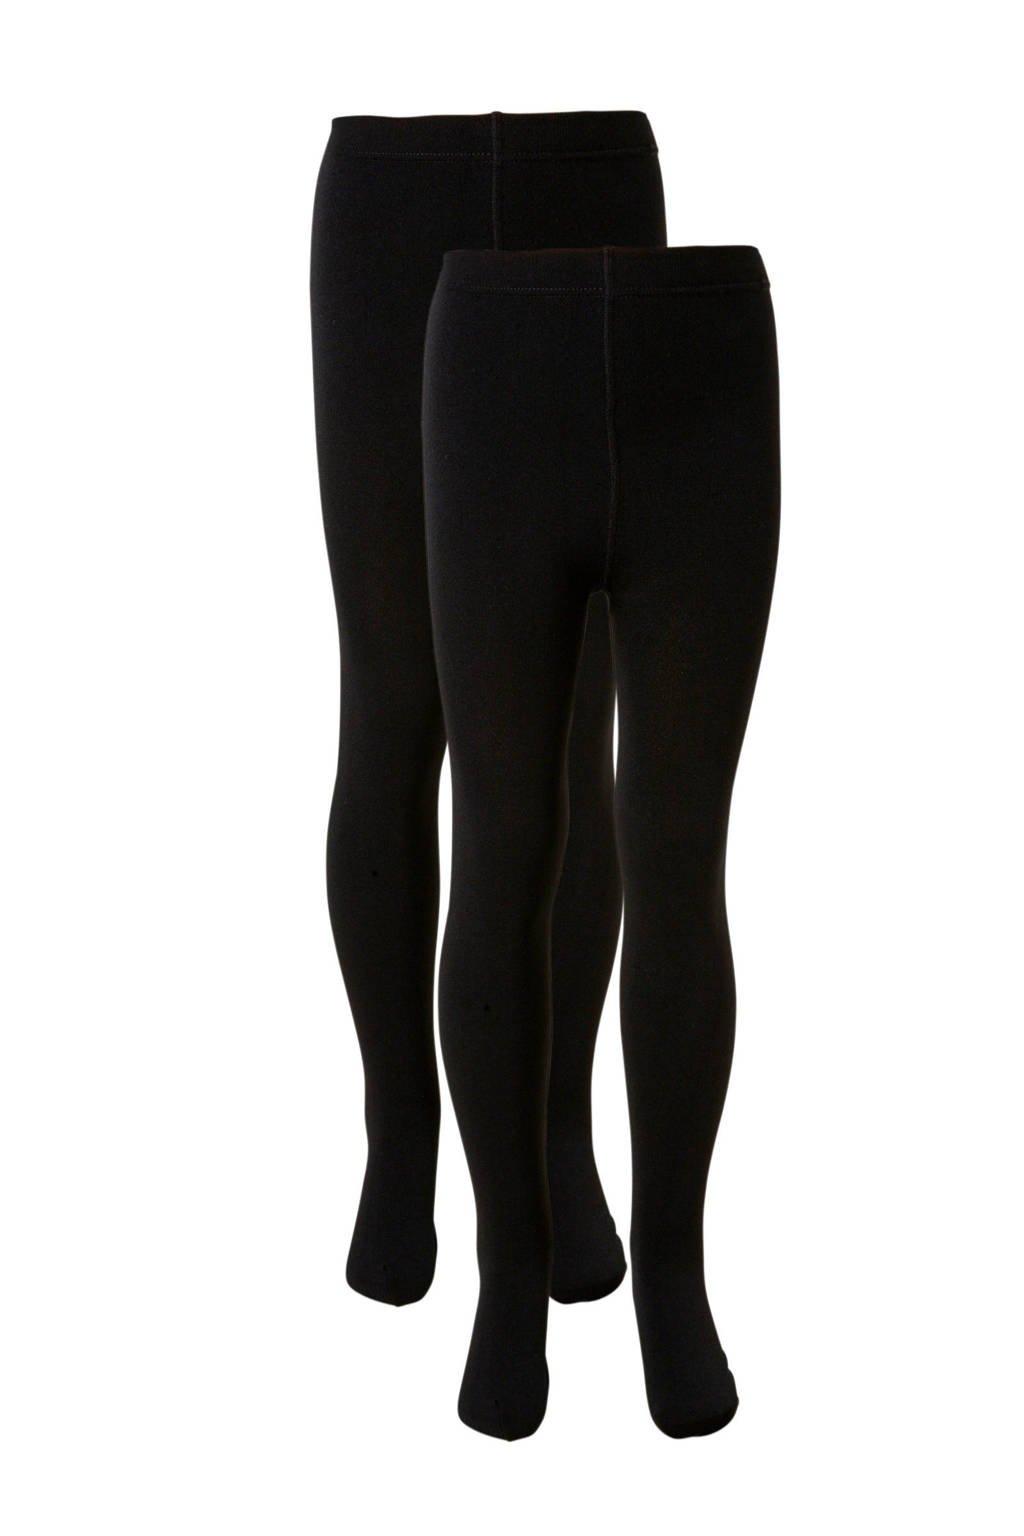 whkmp's own thermo maillot - set van 2 zwart, Zwart